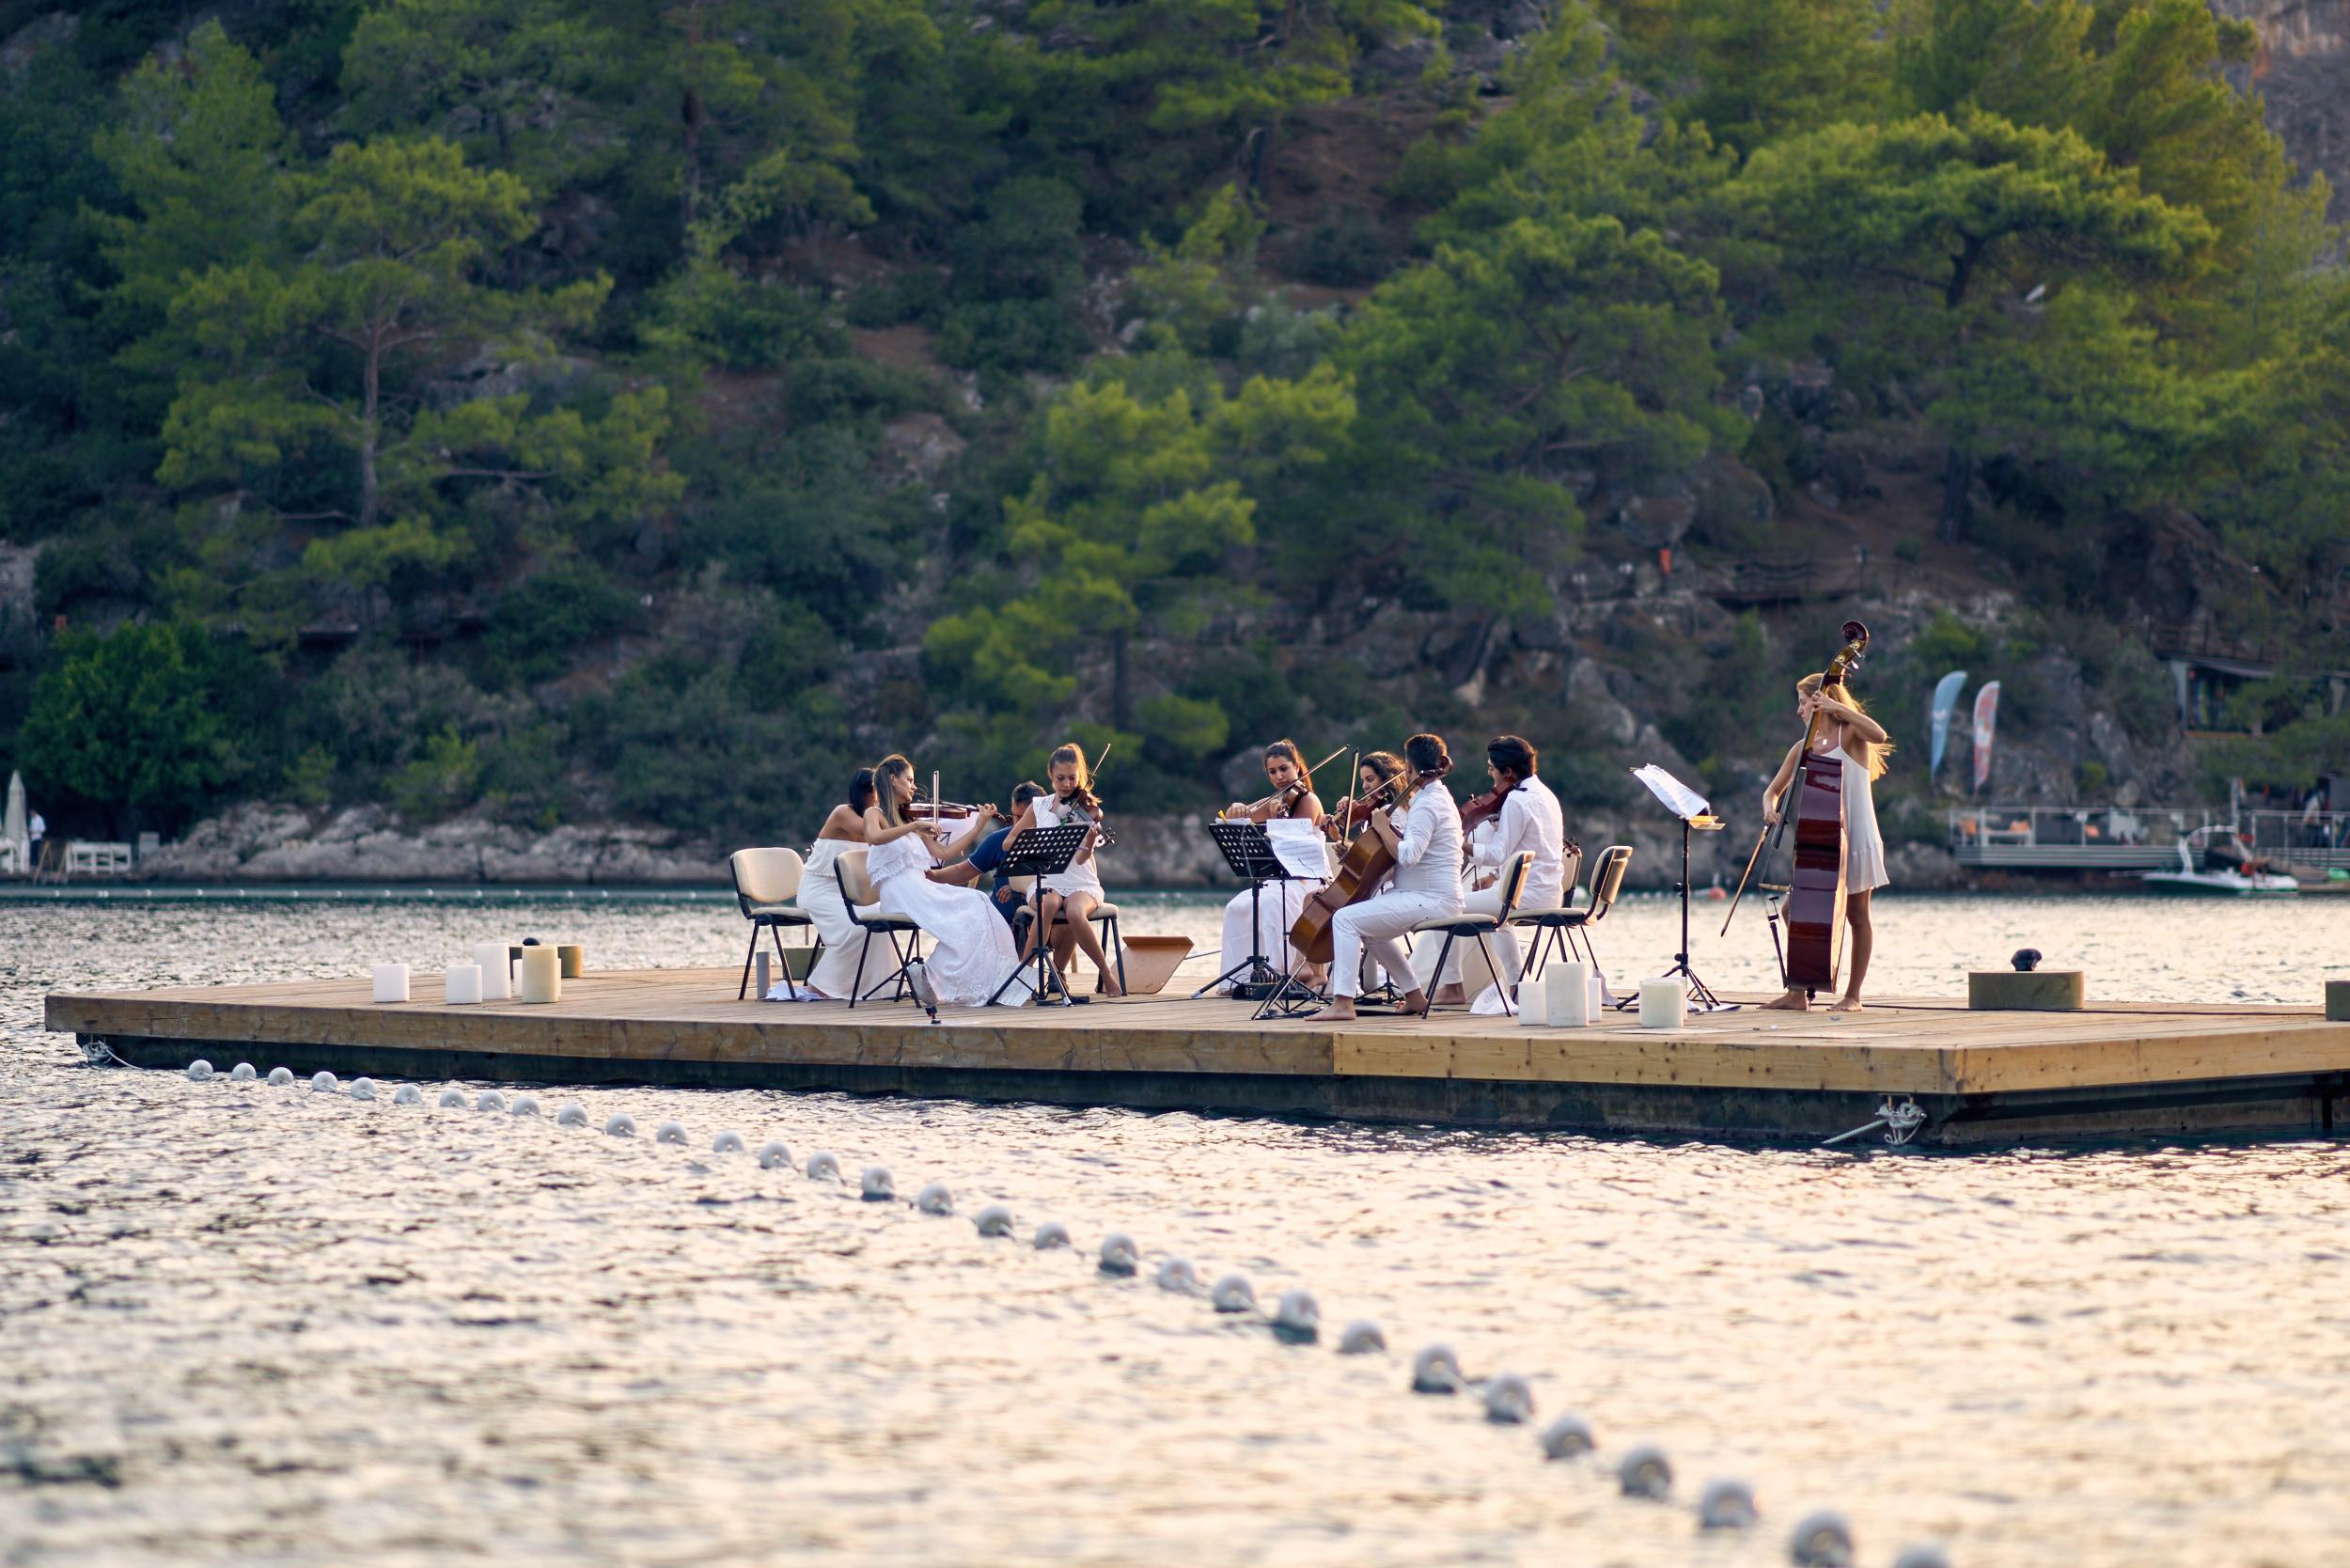 billur saatci, offnegiysem, street style, turkish style blogger, hillside beach club, sunset, ankara oda orkestrası,